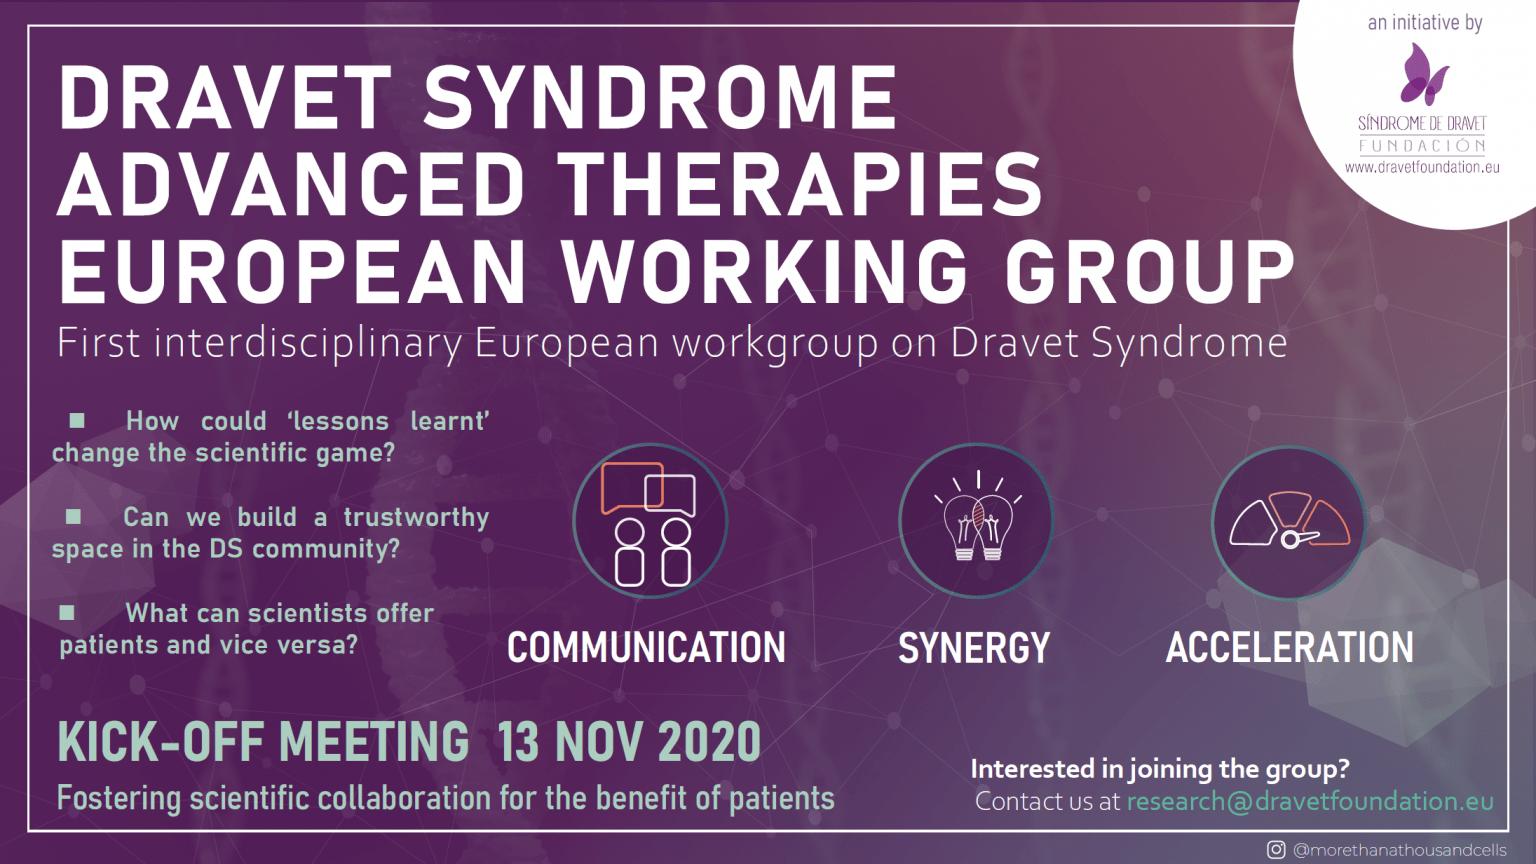 Dravet Syndrome Advanced Therapies European Working Group